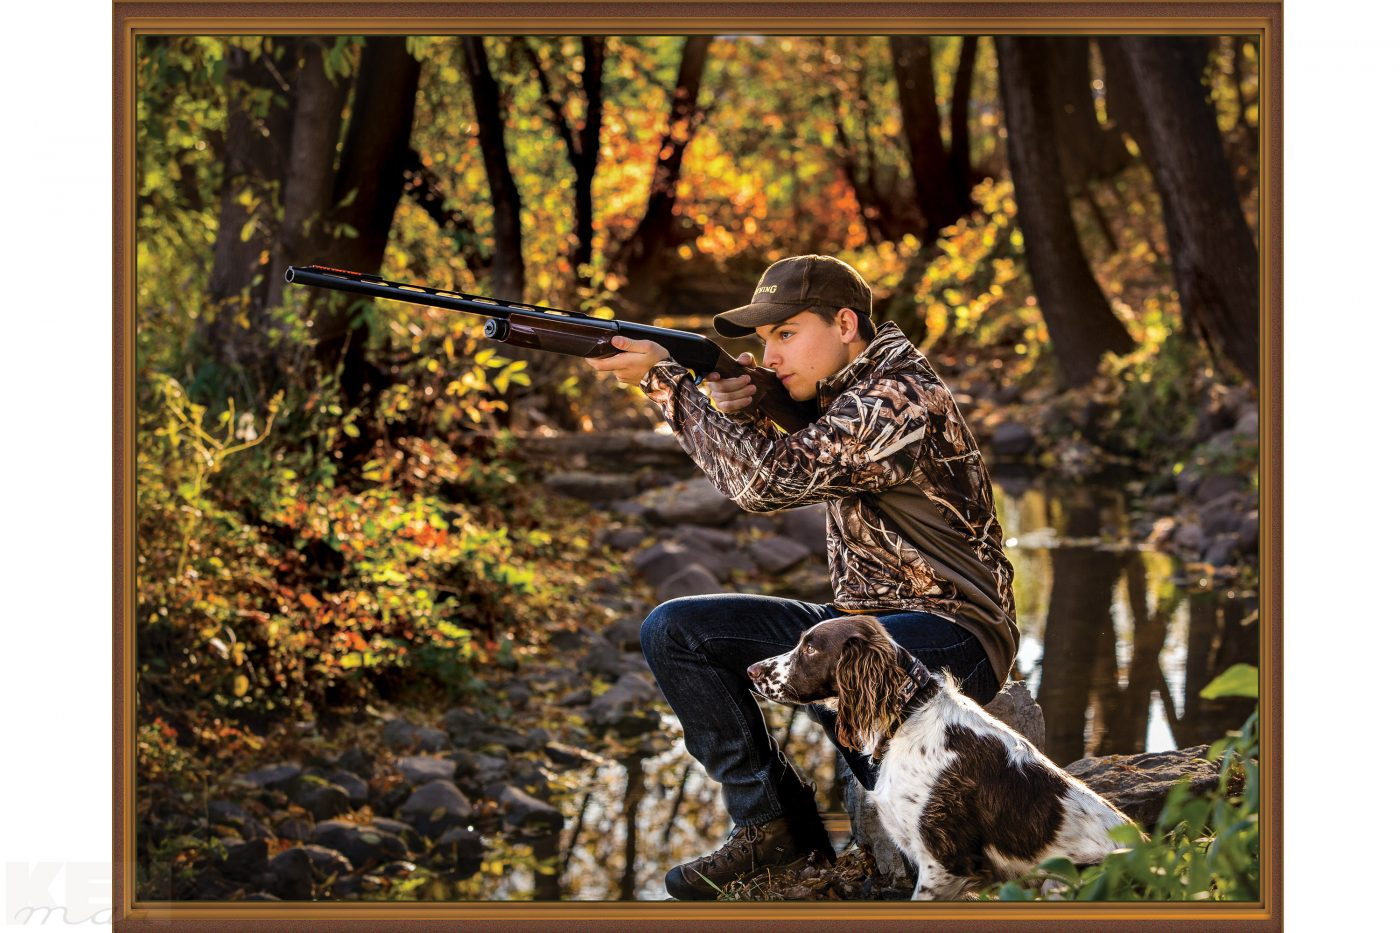 A boy, a dog, a gun, hunting.